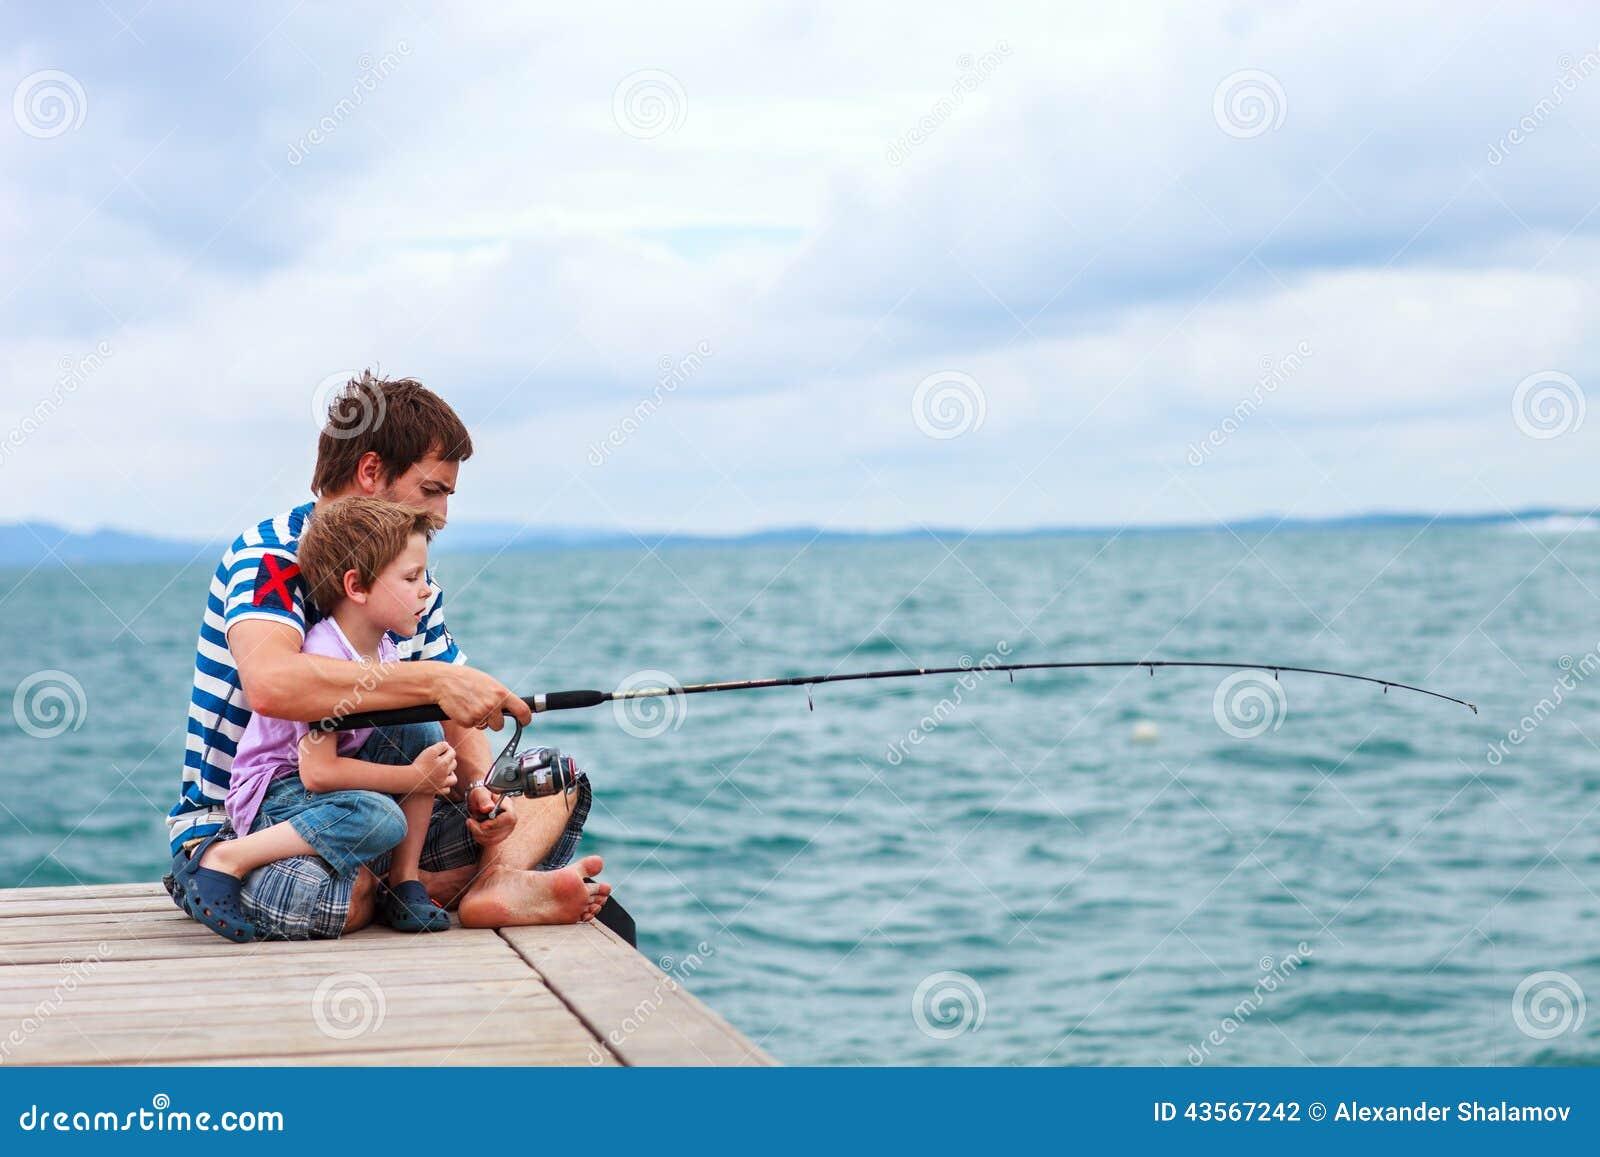 Faderfiskeson tillsammans